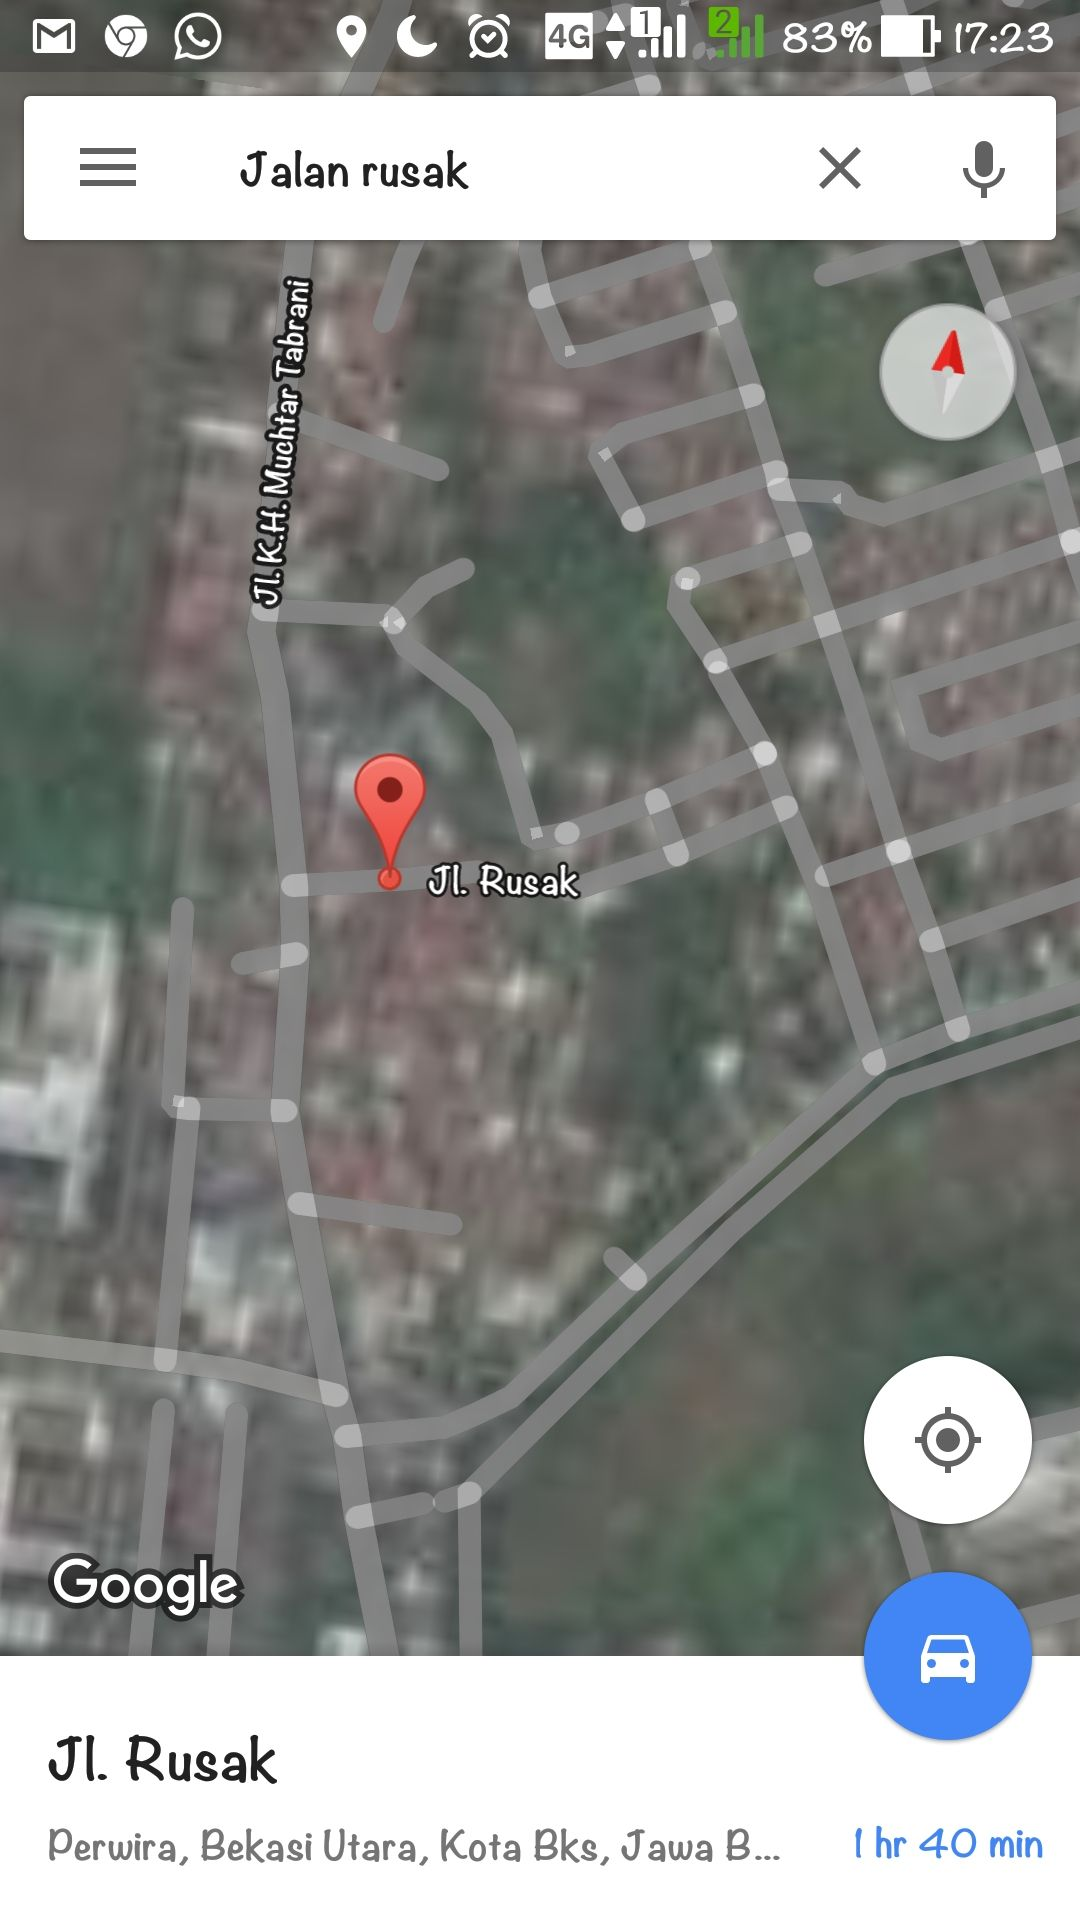 Nama Jalan Aneh Di Google Maps 5